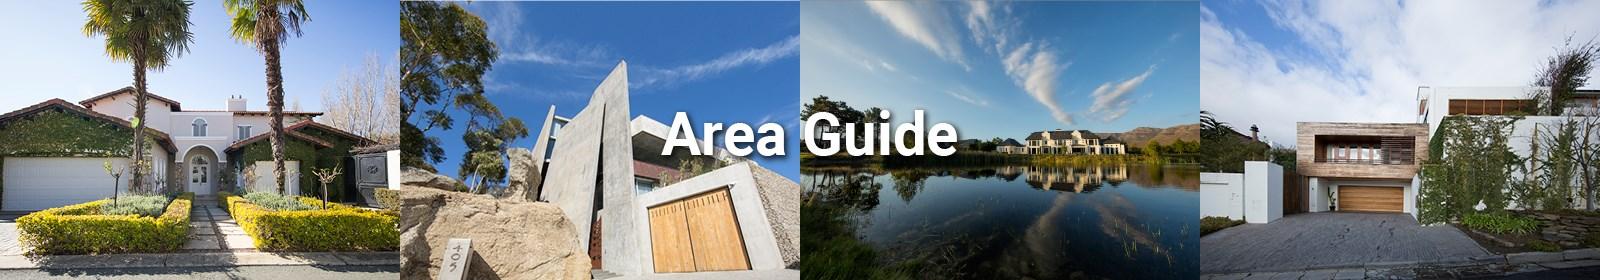 Kenton-on-Sea area and property guide